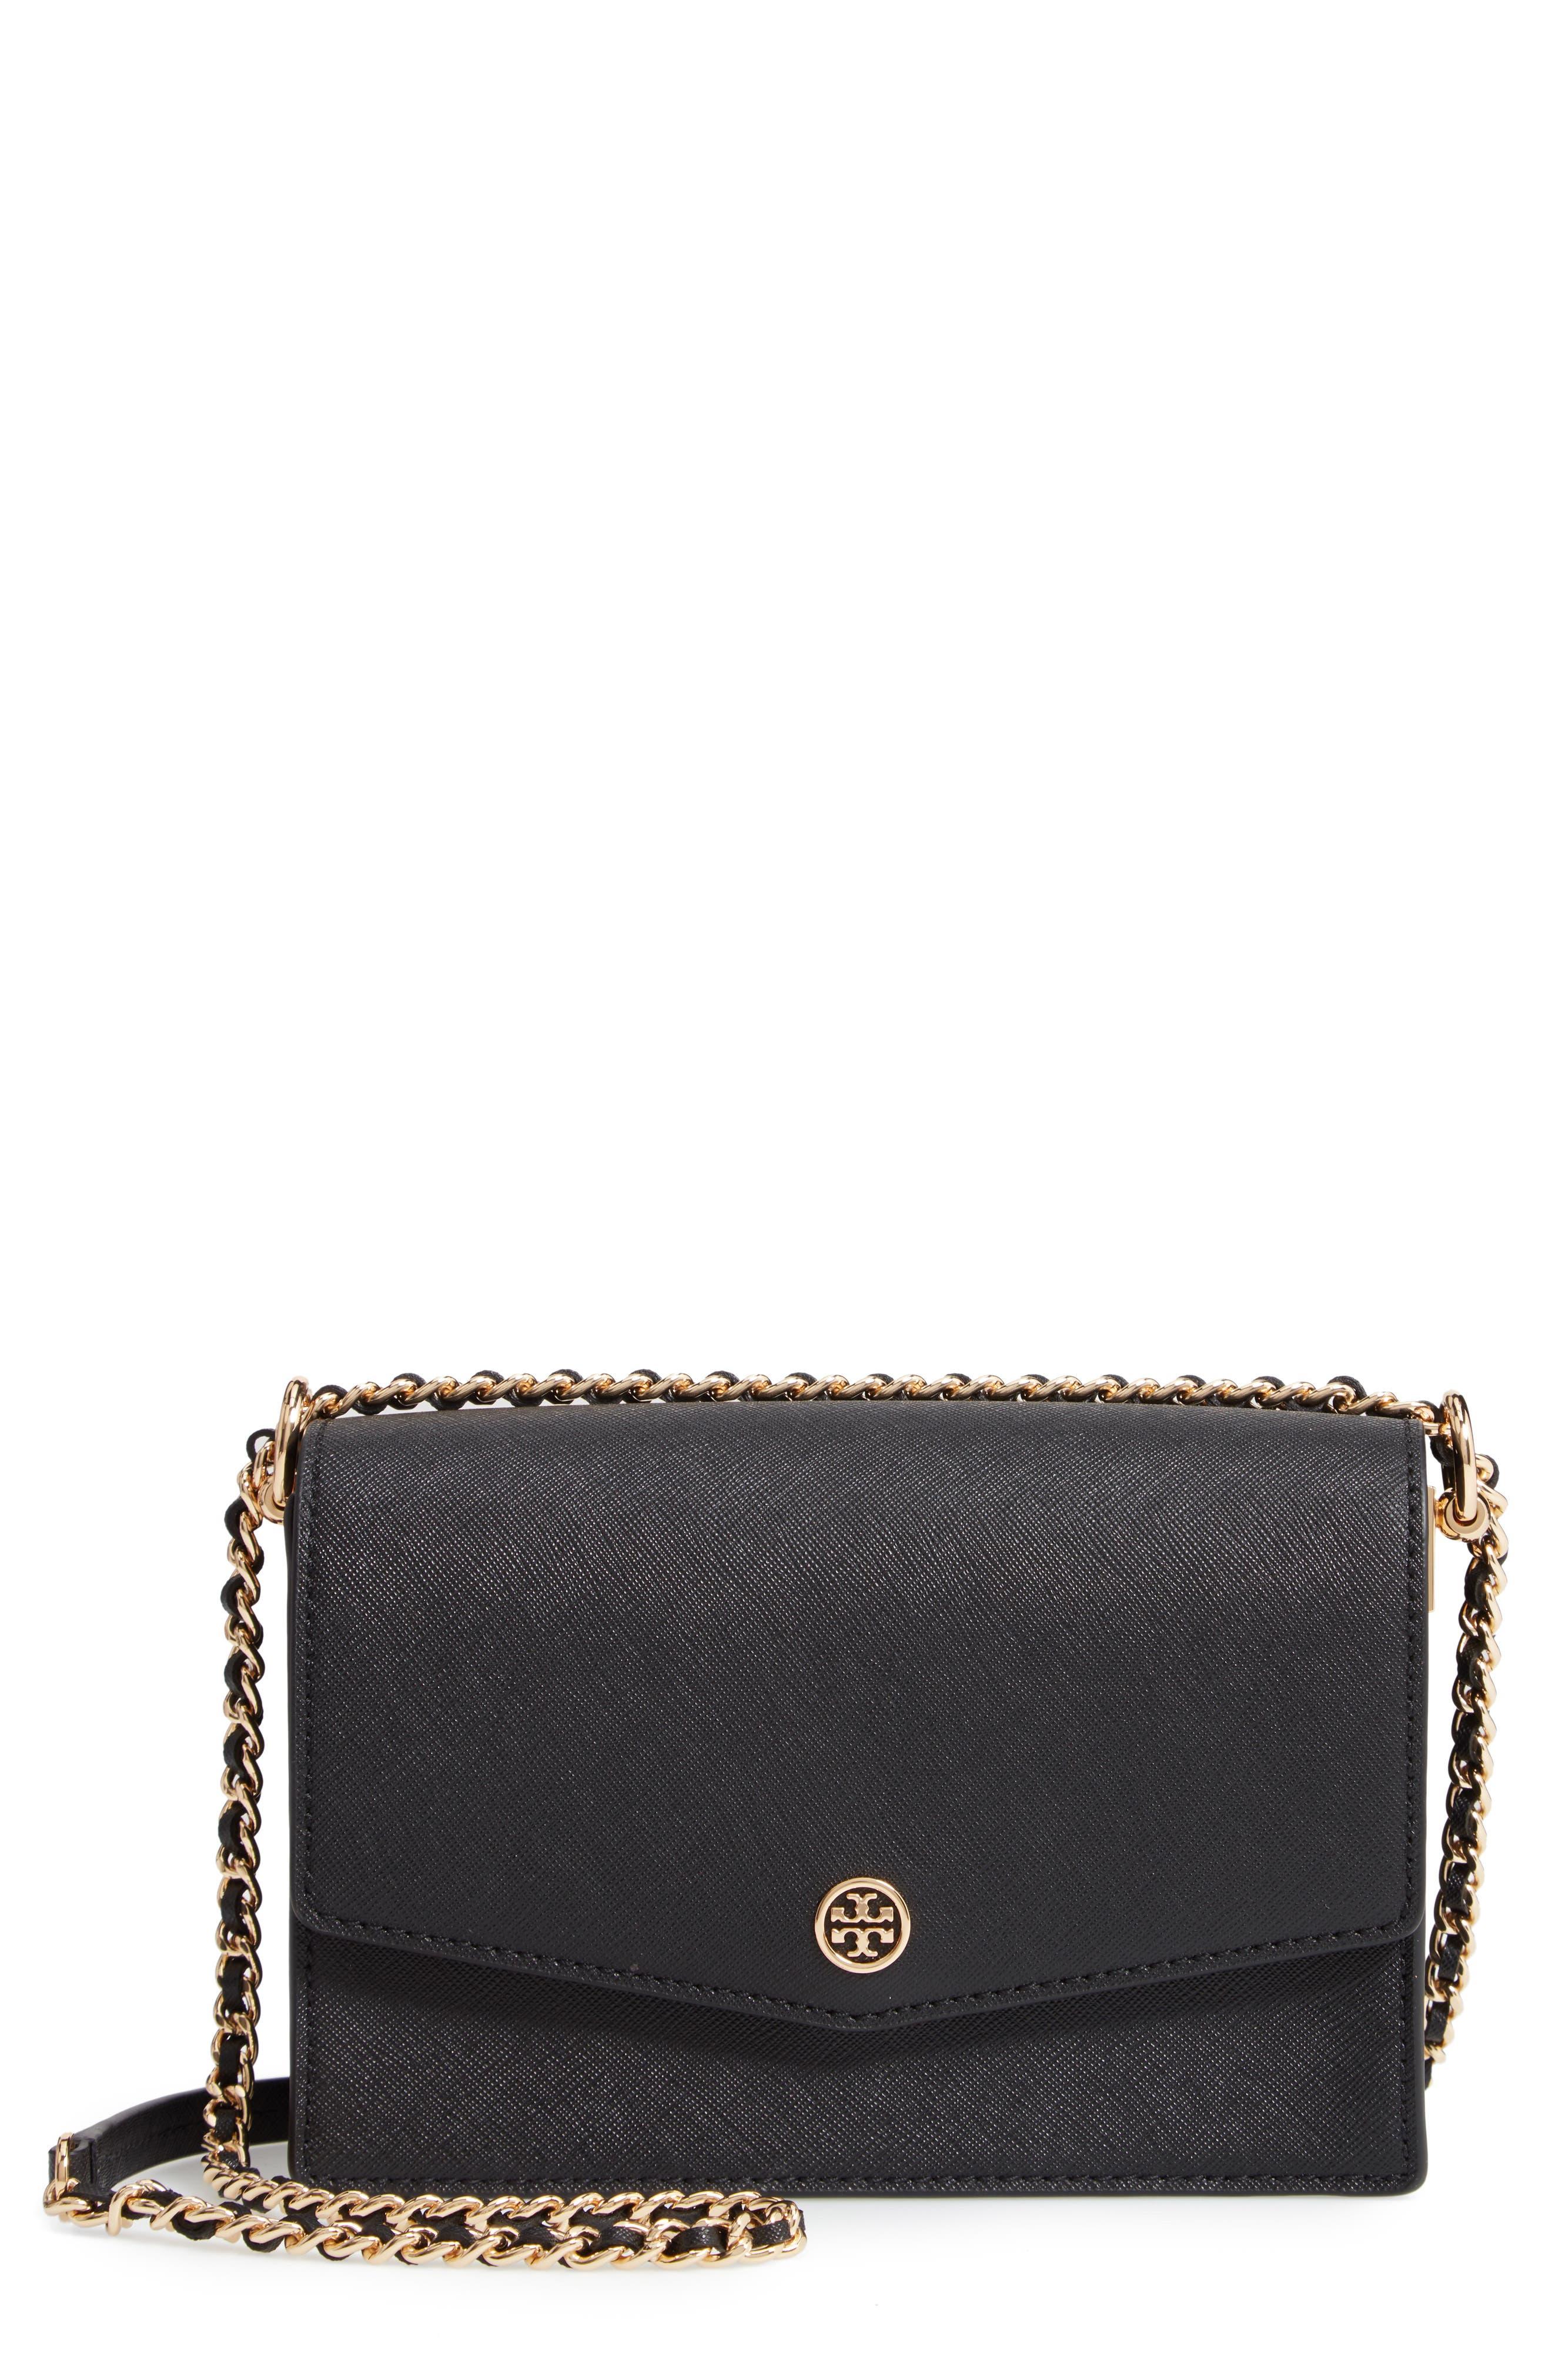 Mini Robinson Convertible Leather Shoulder Bag,                             Main thumbnail 1, color,                             BLACK